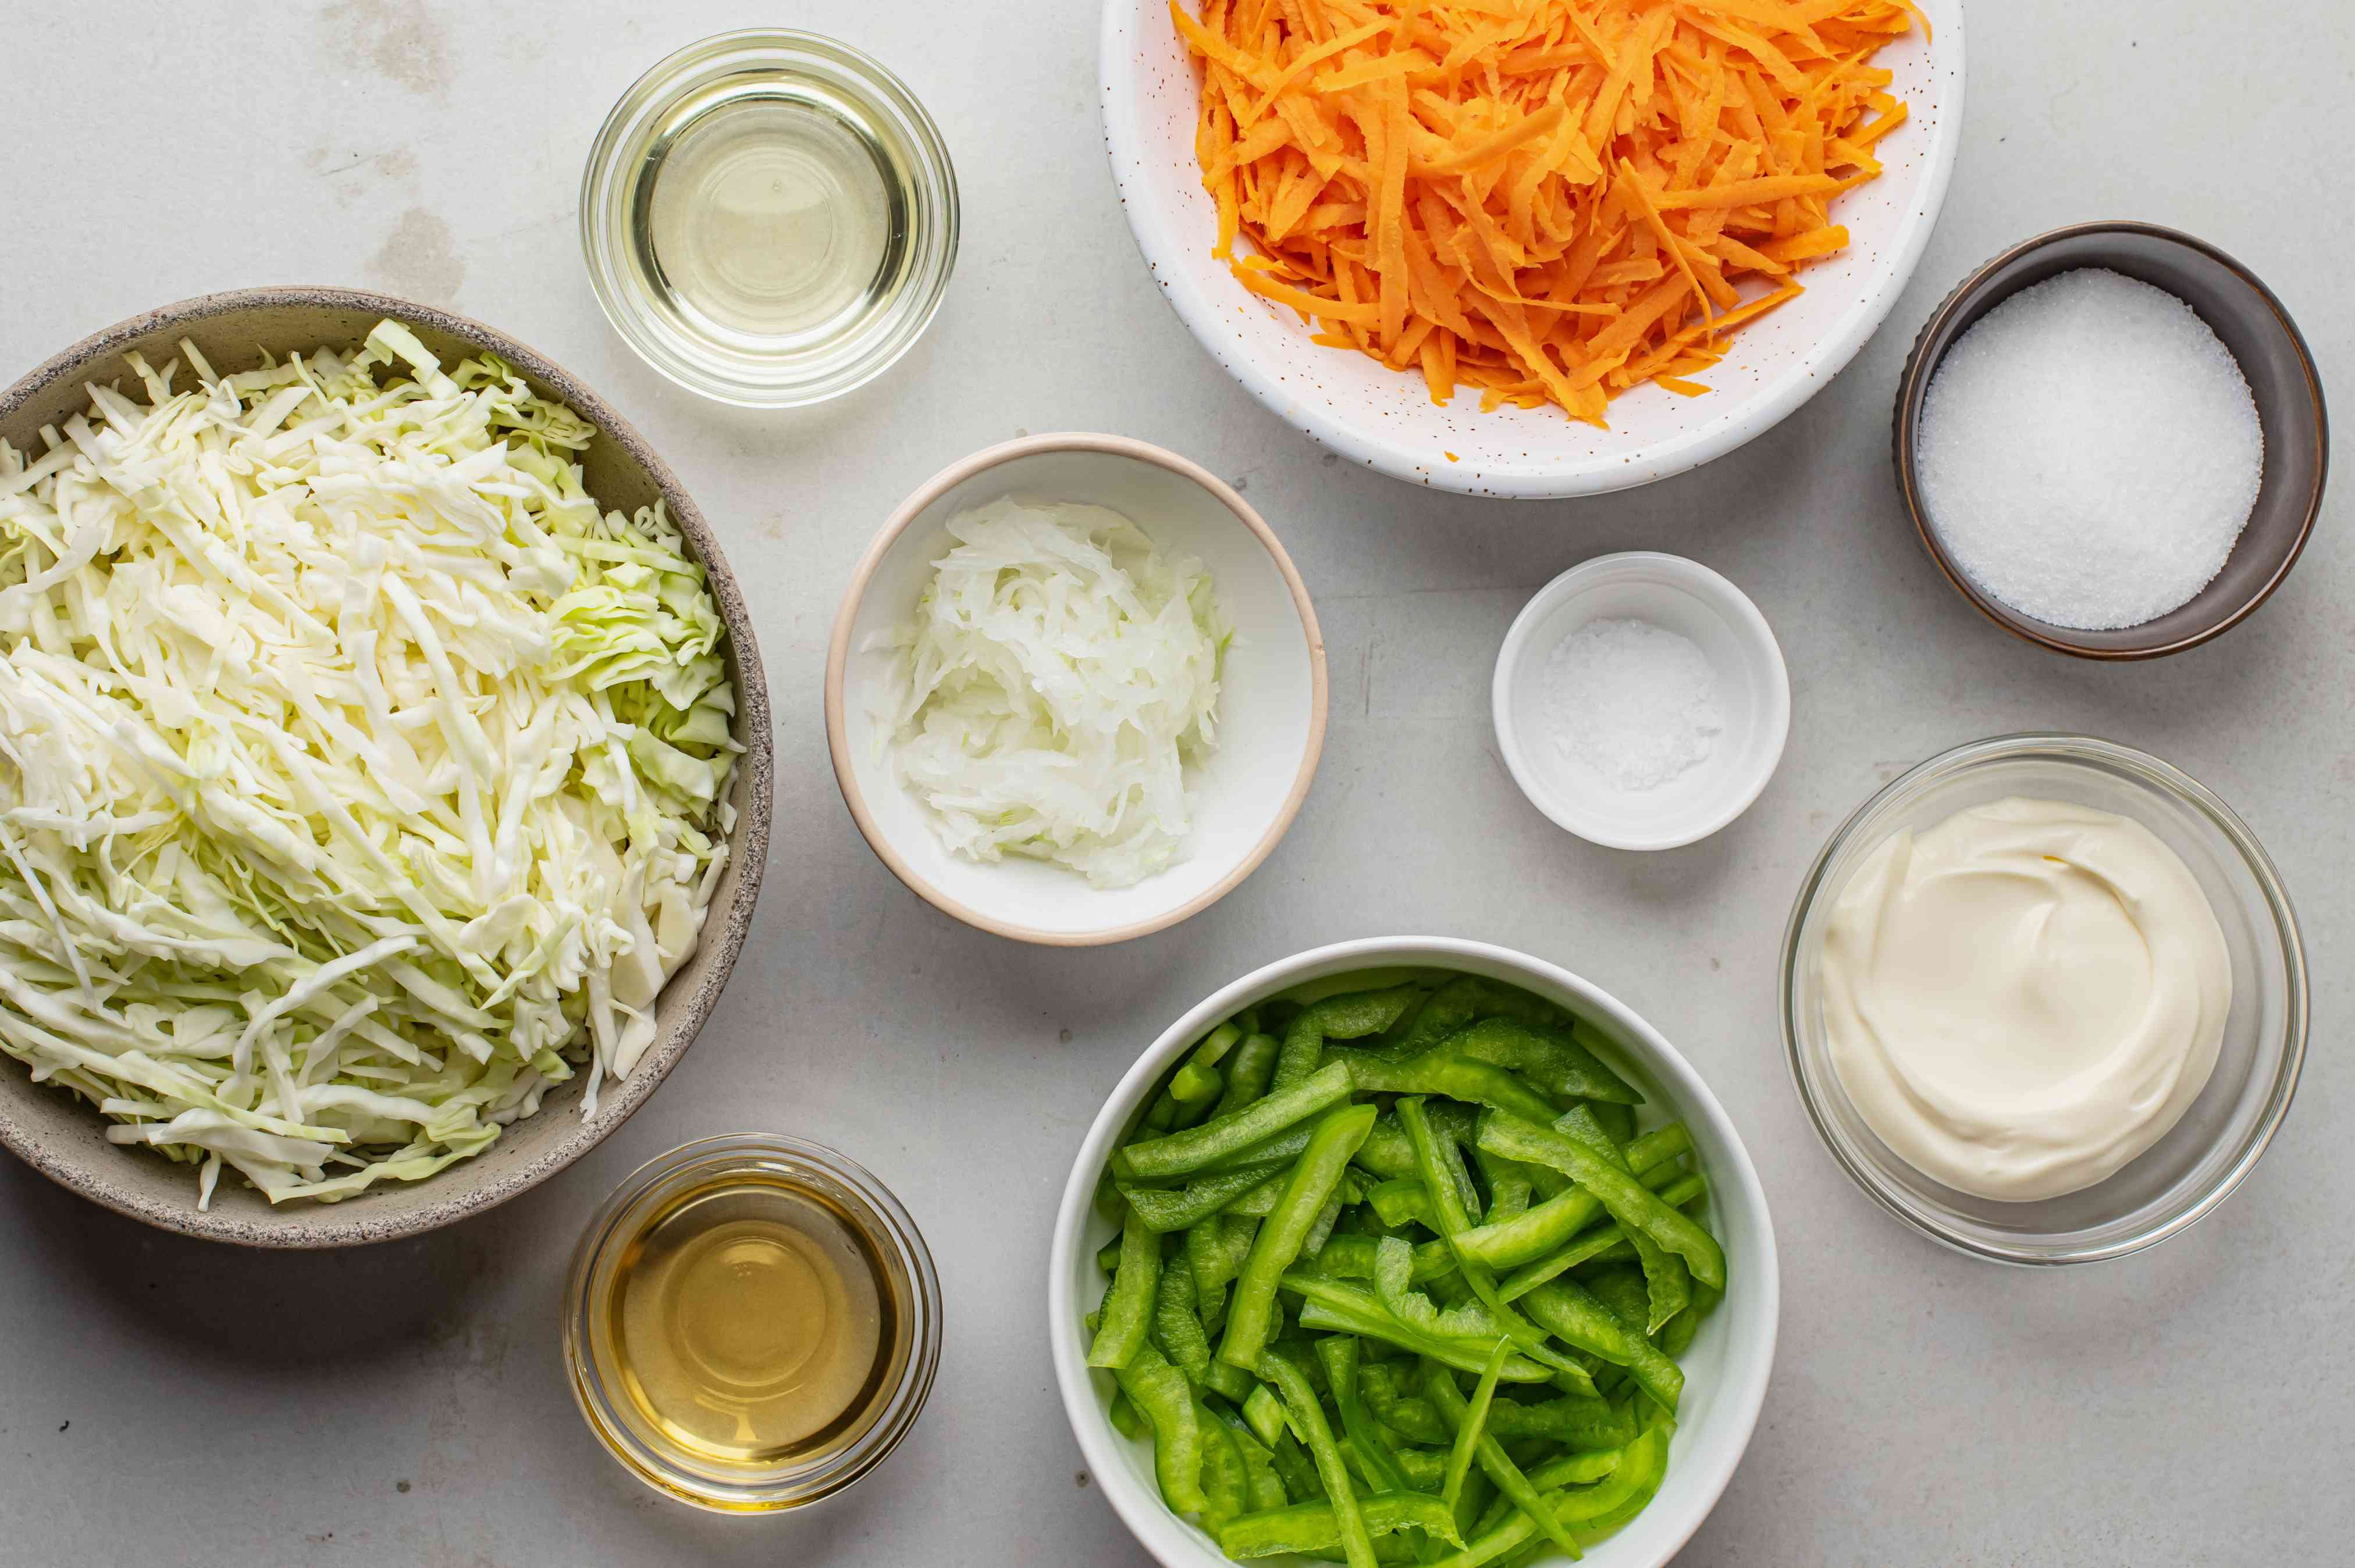 Ingredients for coleslaw with vinegar